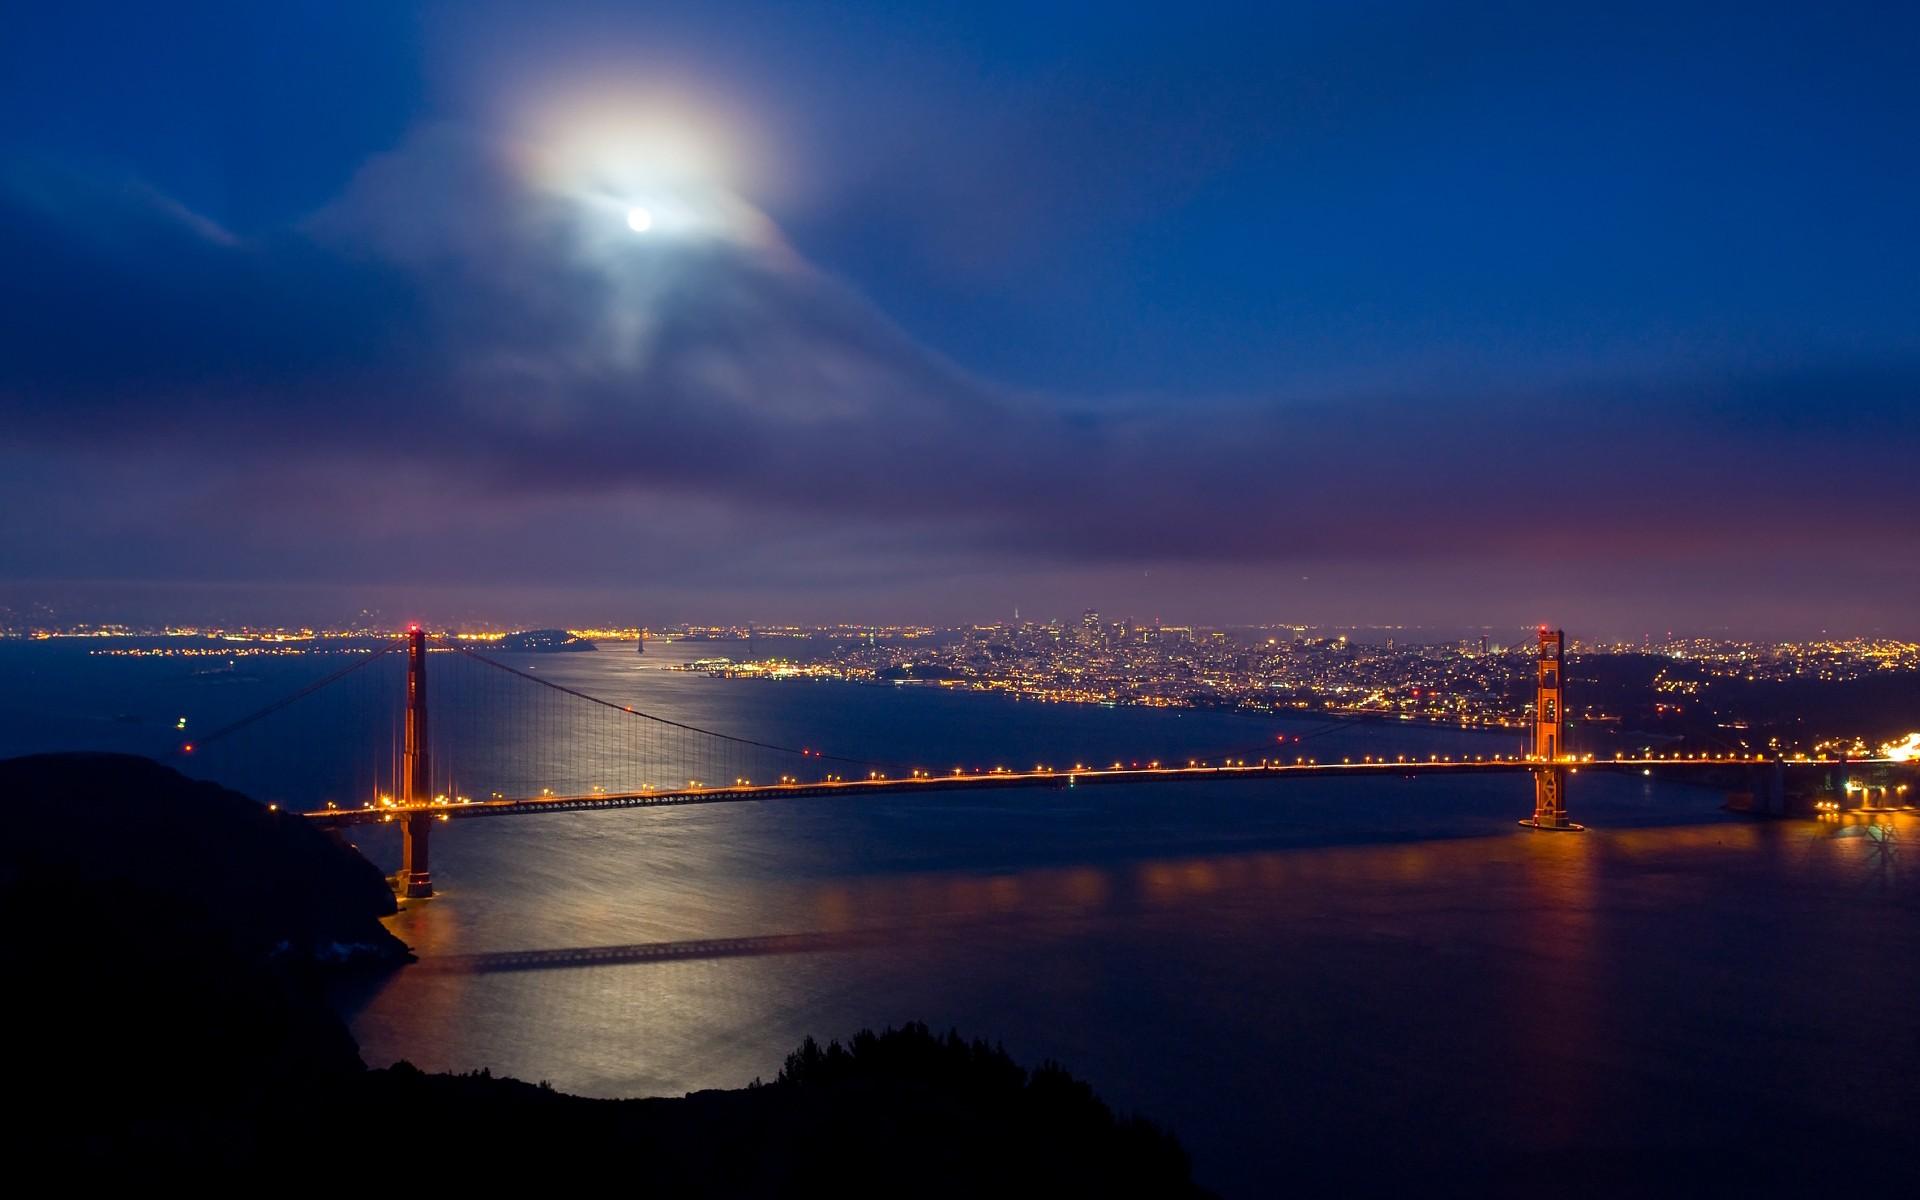 Golden Gate San Francisco world architecture bridges cities skyline 1920x1200